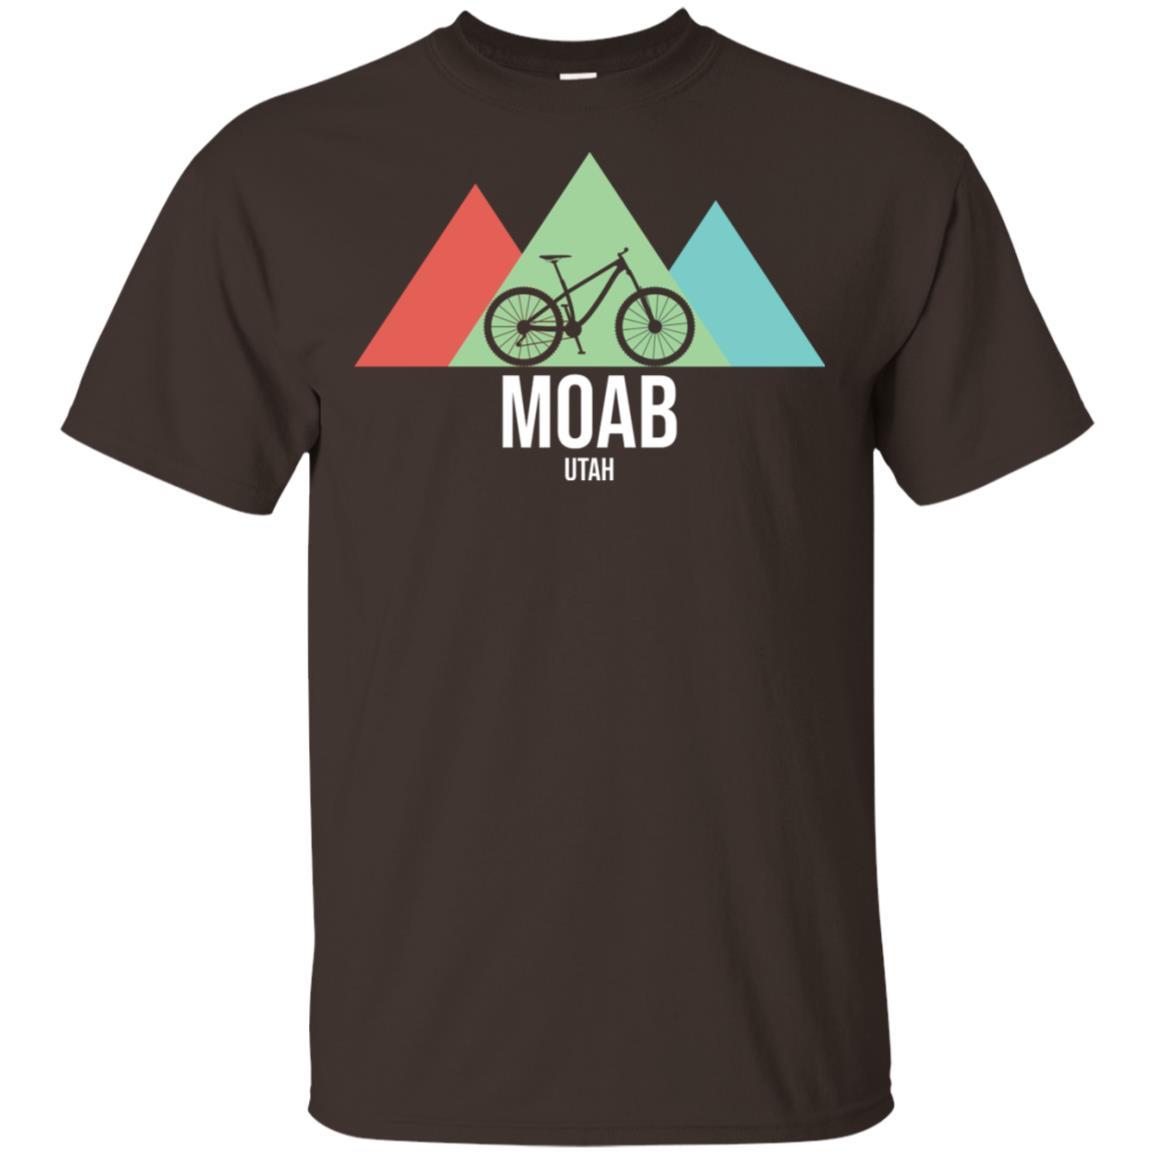 Retro Vintage Bike Moab Utah Mountain Biking Unisex Short Sleeve